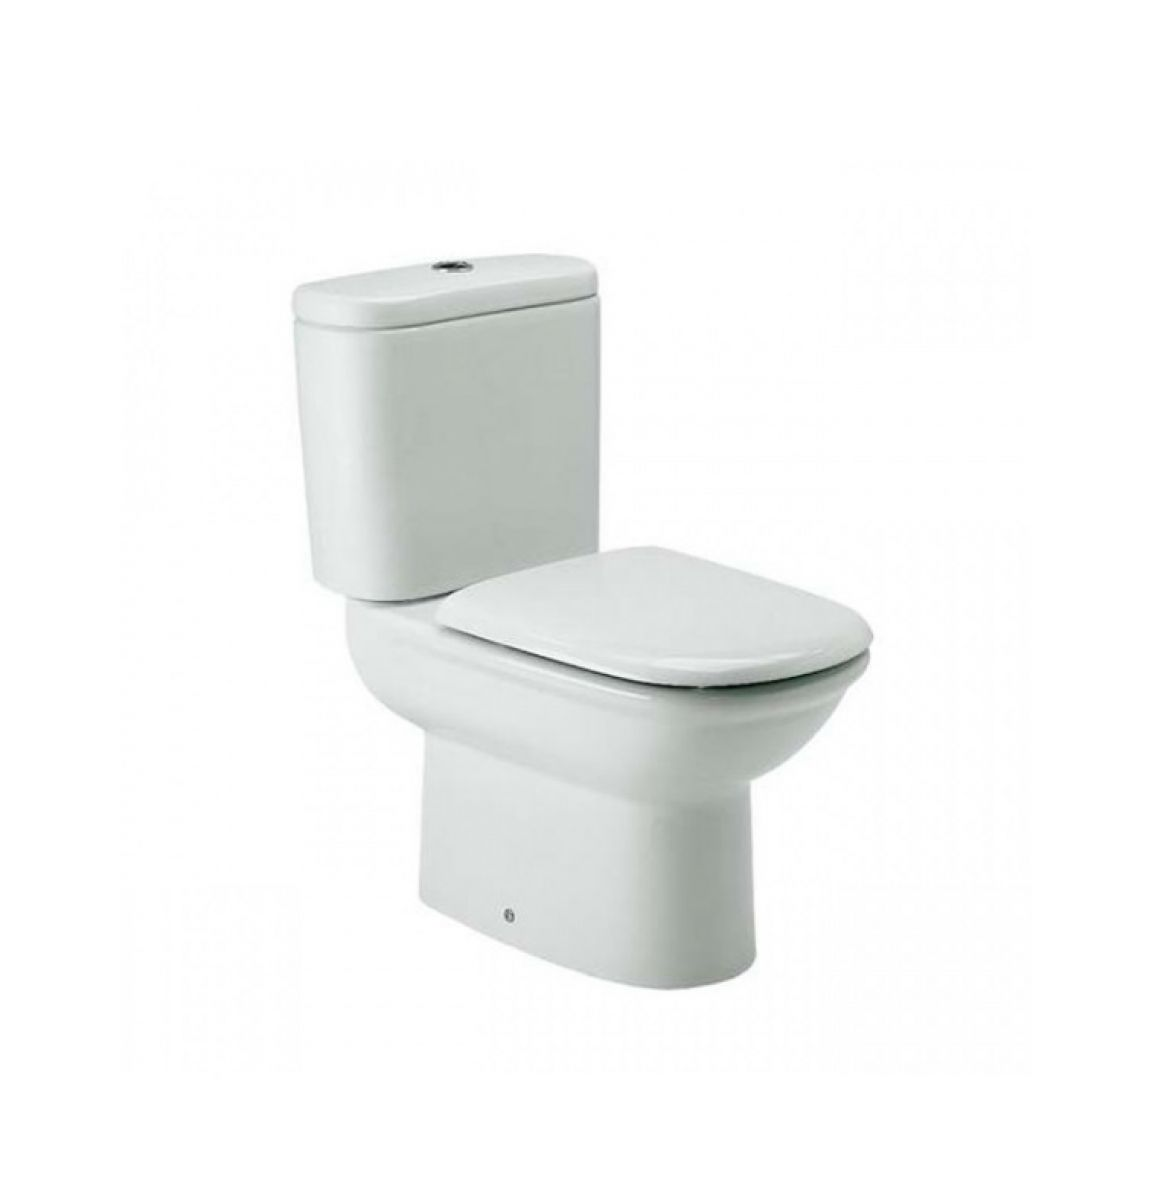 Roca Giralda Close Coupled Wc Suite Uk Bathrooms